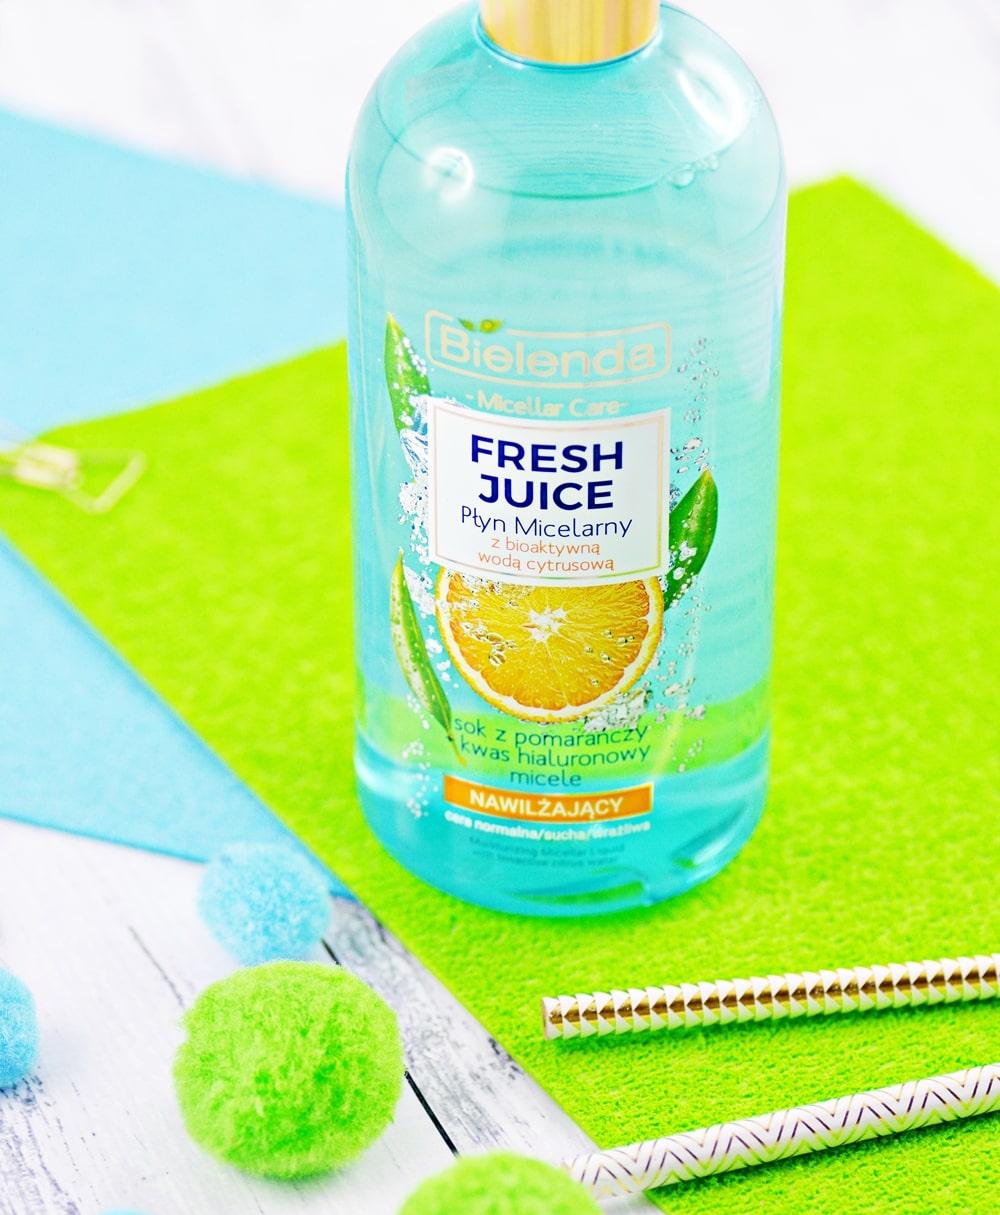 bielenda fresh juice płyn micelarny